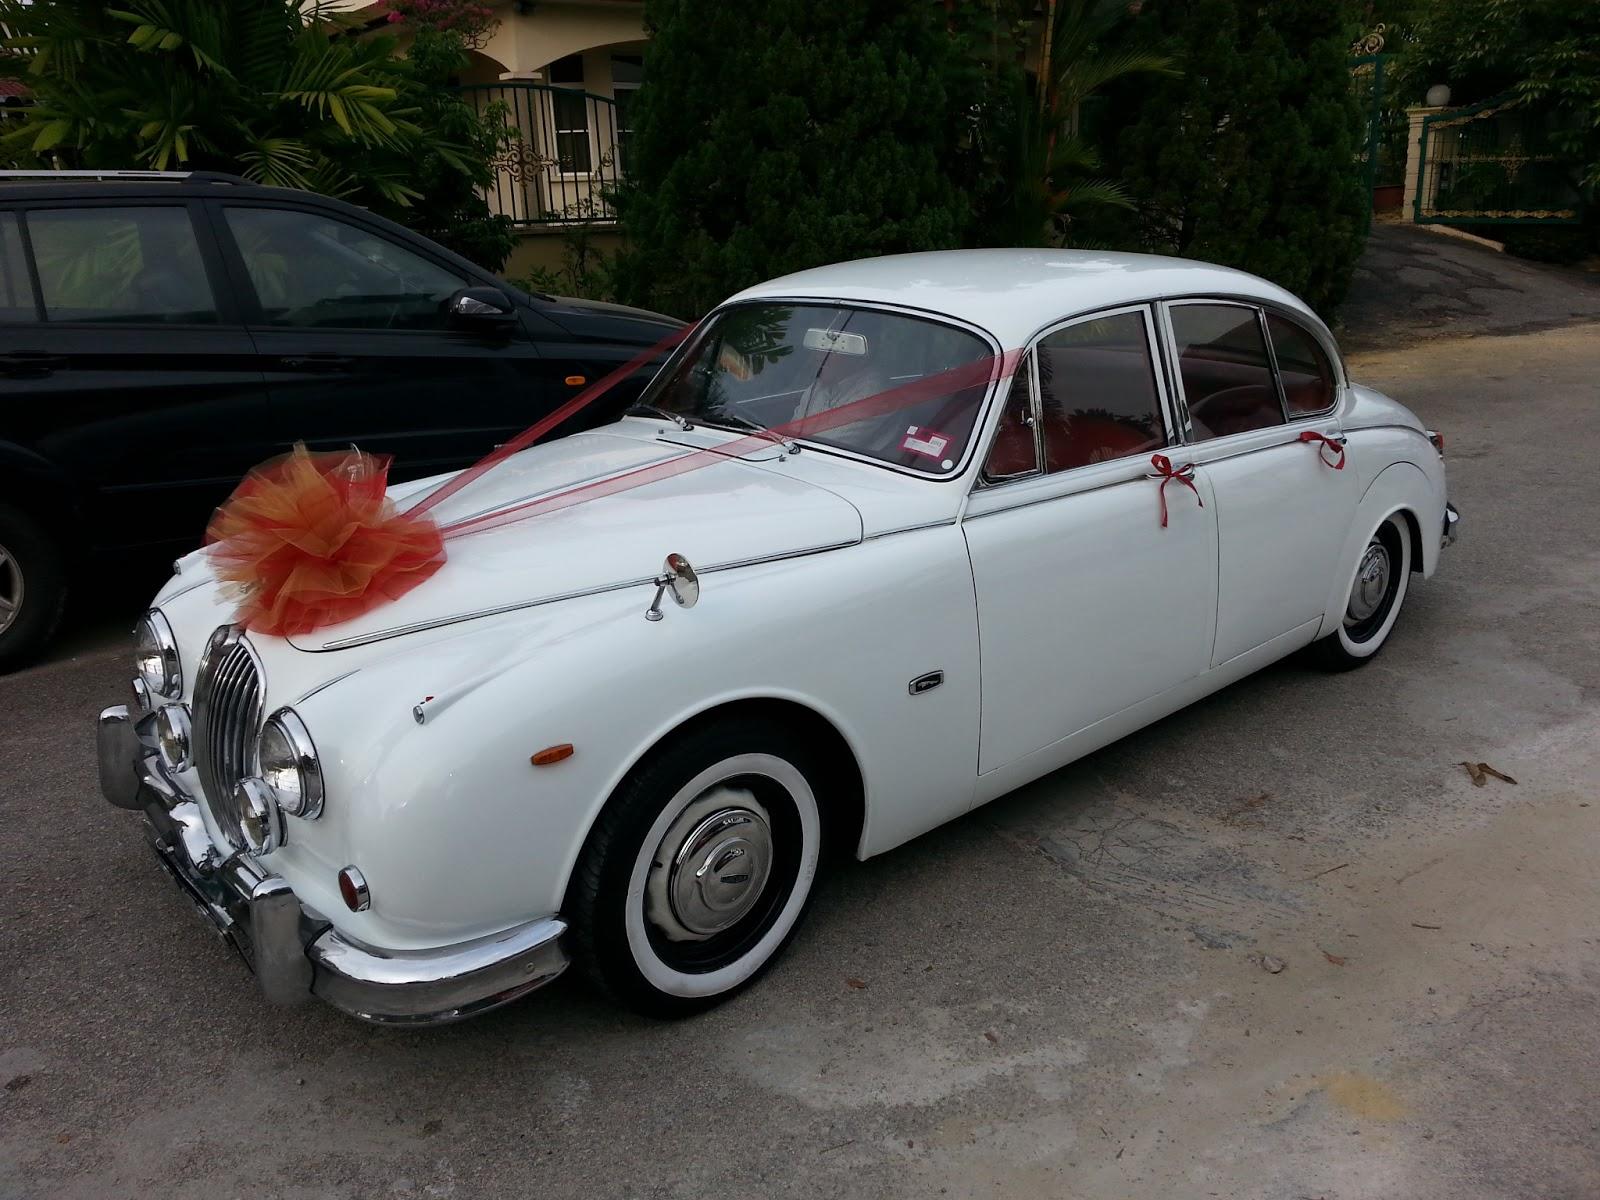 redorca malaysia wedding and event car rental jaguar mk2 wedding rental in june 2013. Black Bedroom Furniture Sets. Home Design Ideas